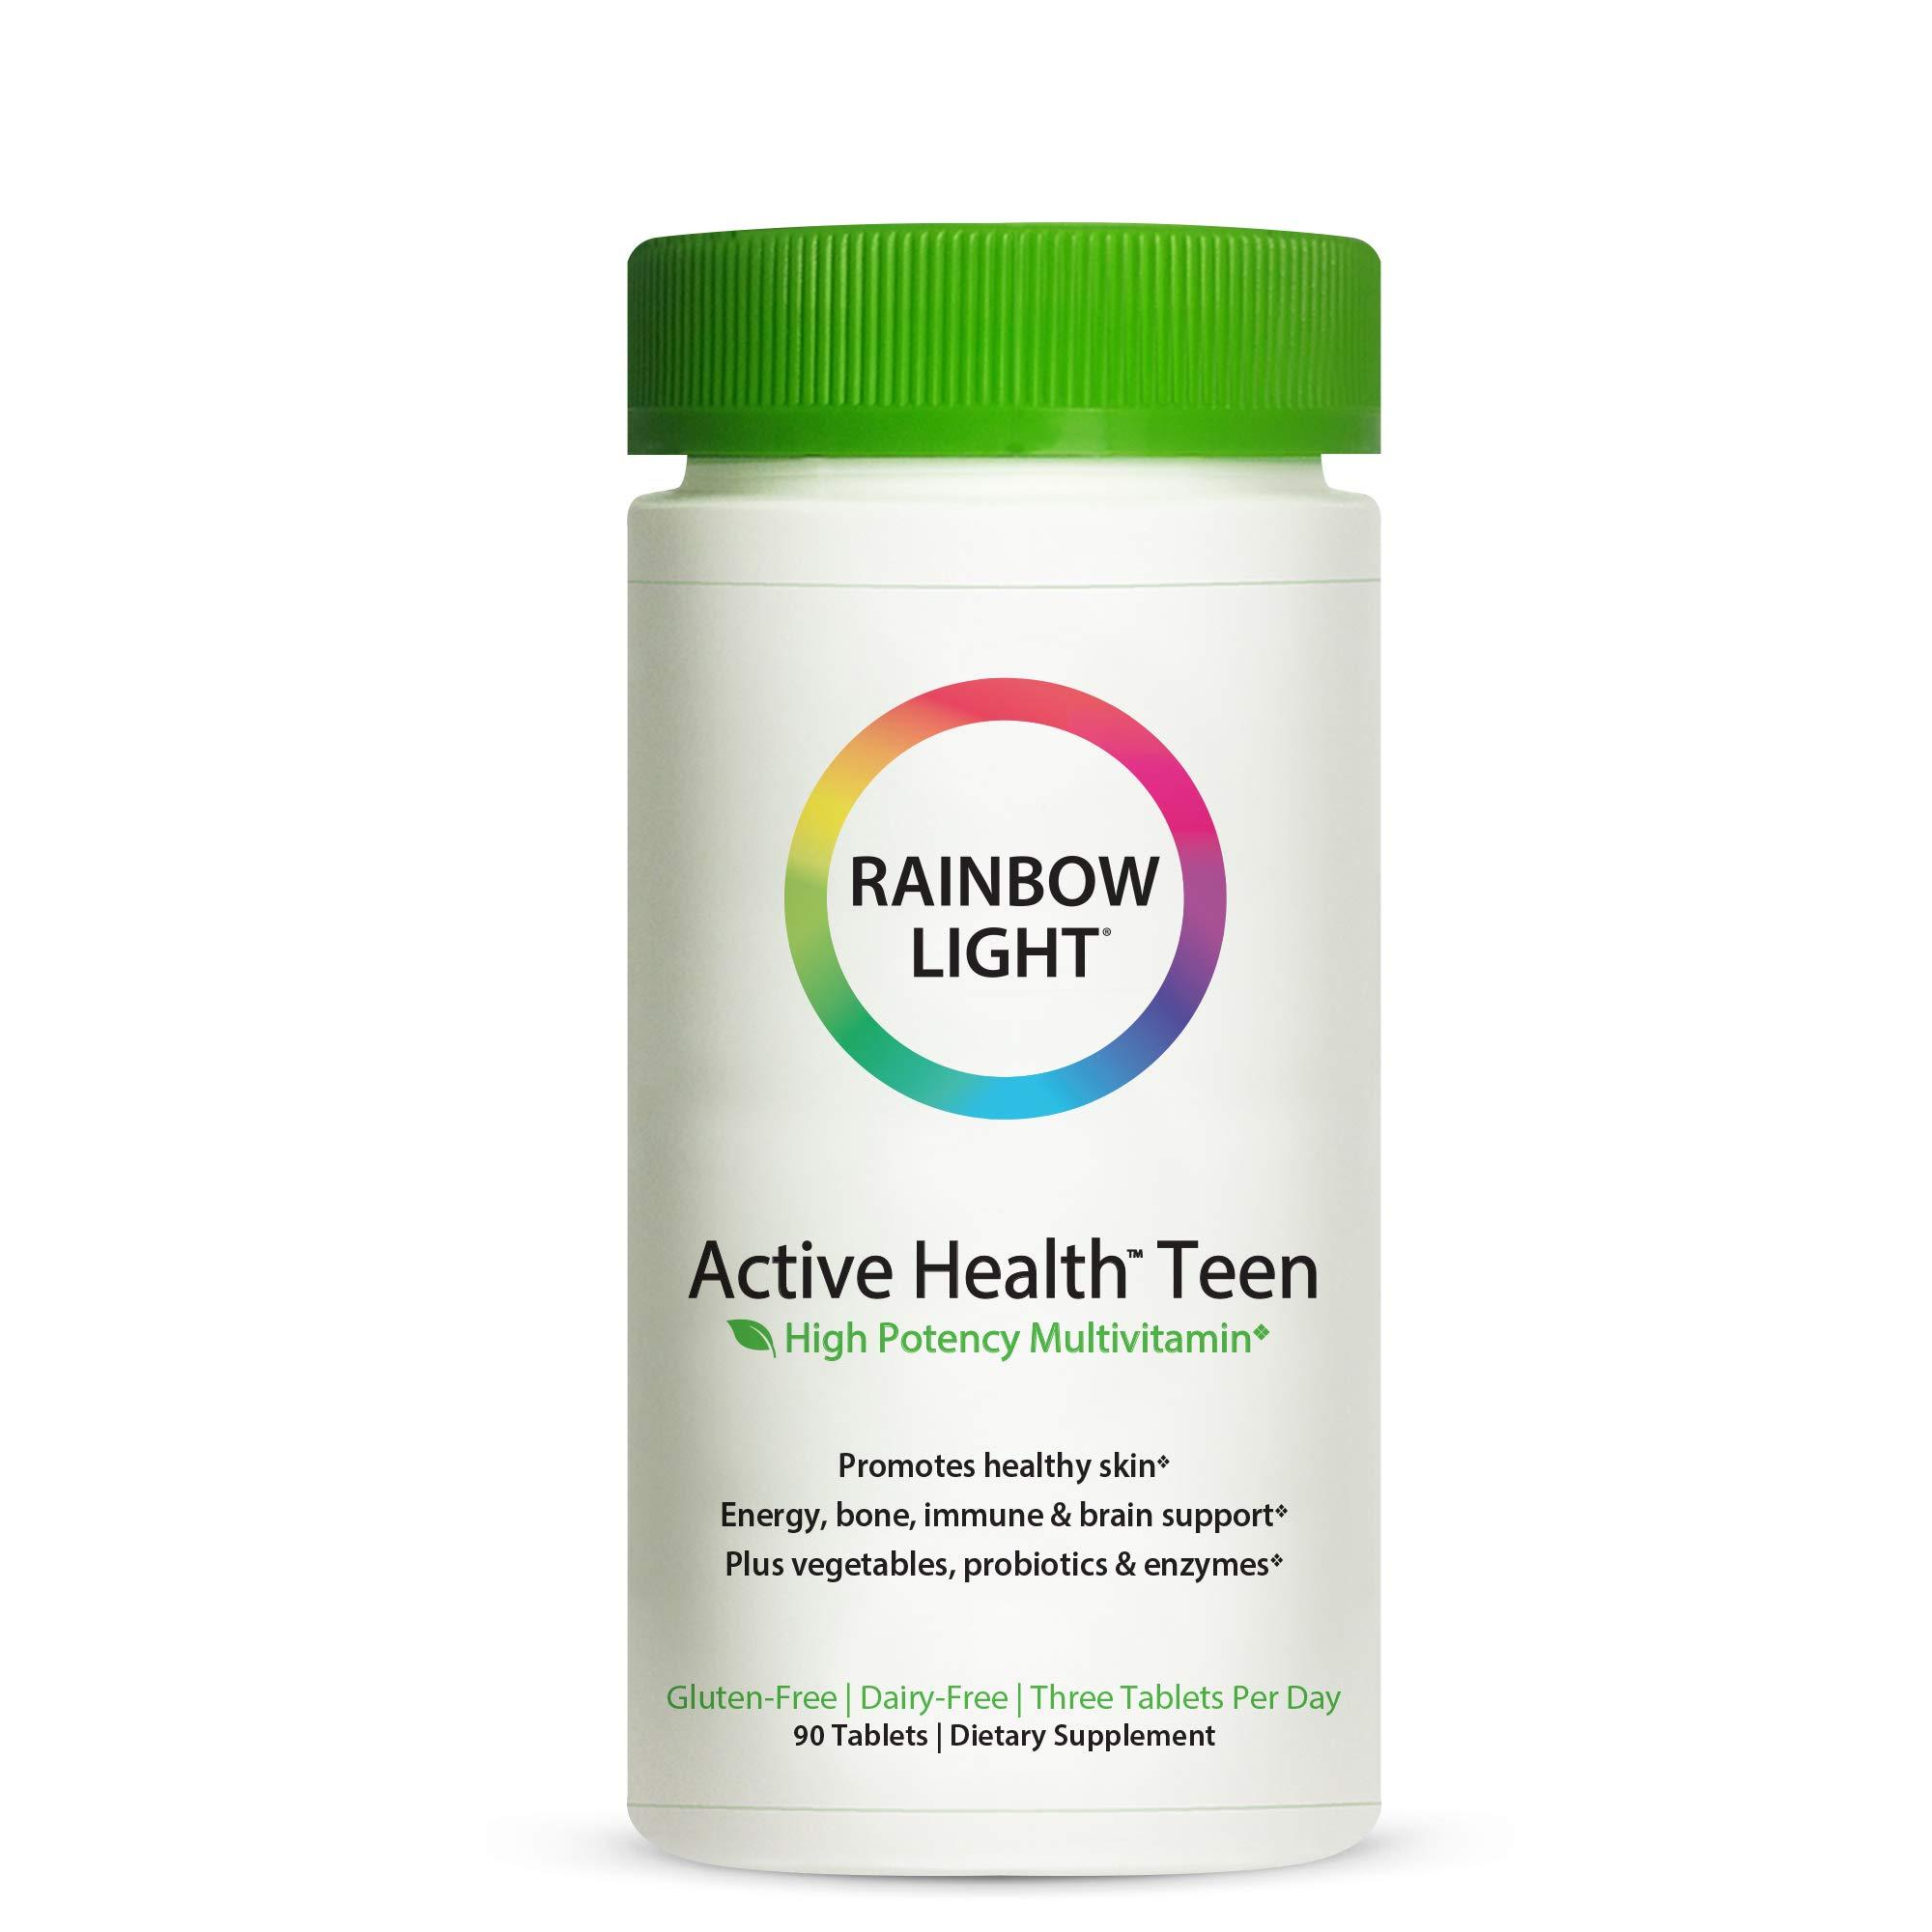 Rainbow Light Multivitamin DermaComplex Nutrients